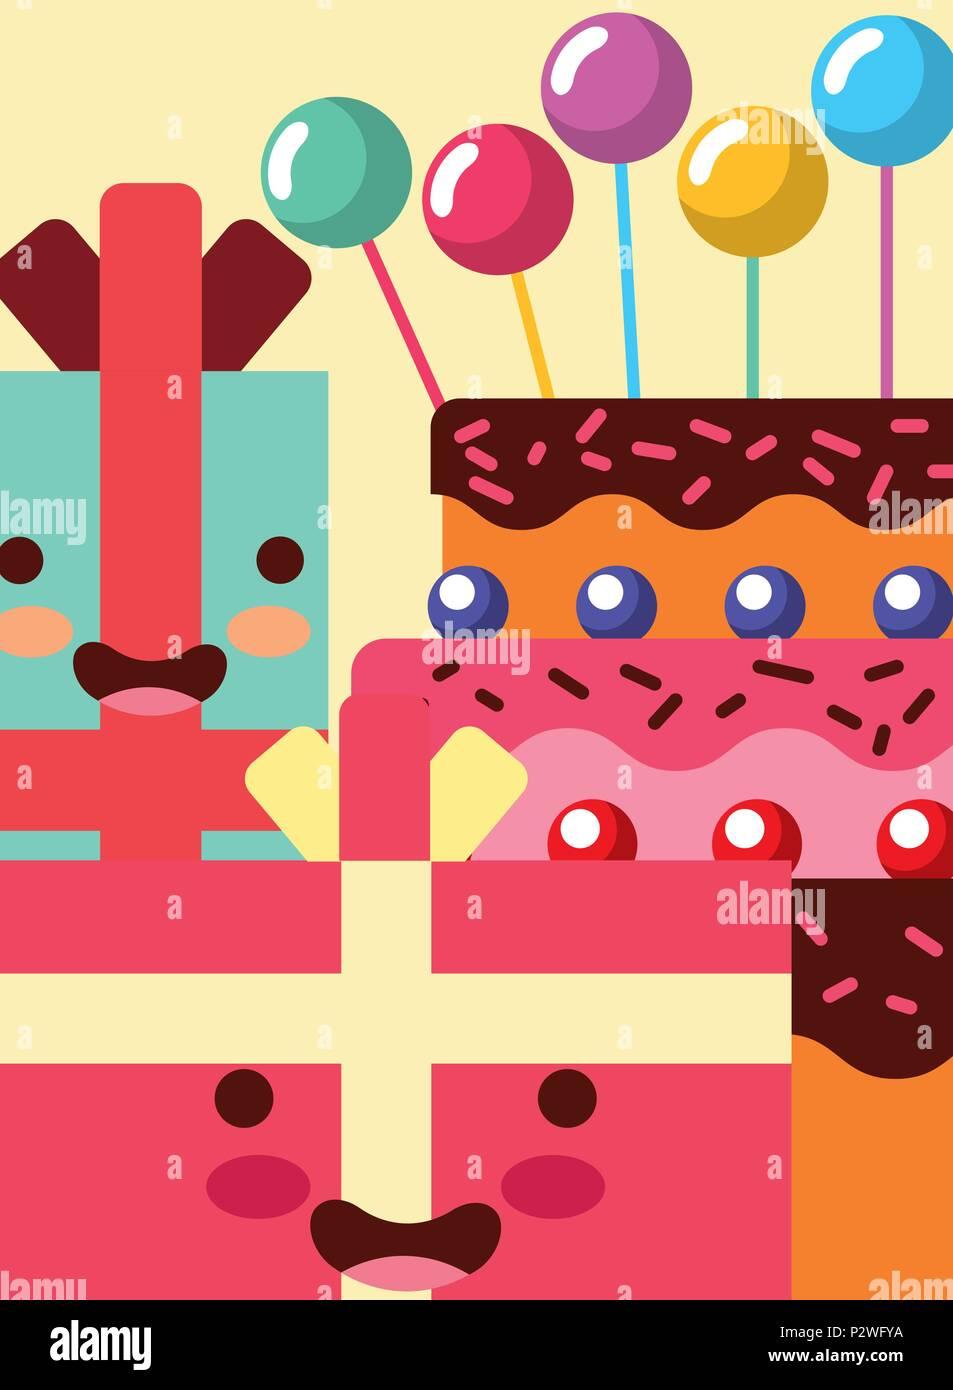 Cadeaux Kawaii Cartoon Gateau Sucre Decoration Bulles Happy Birthday